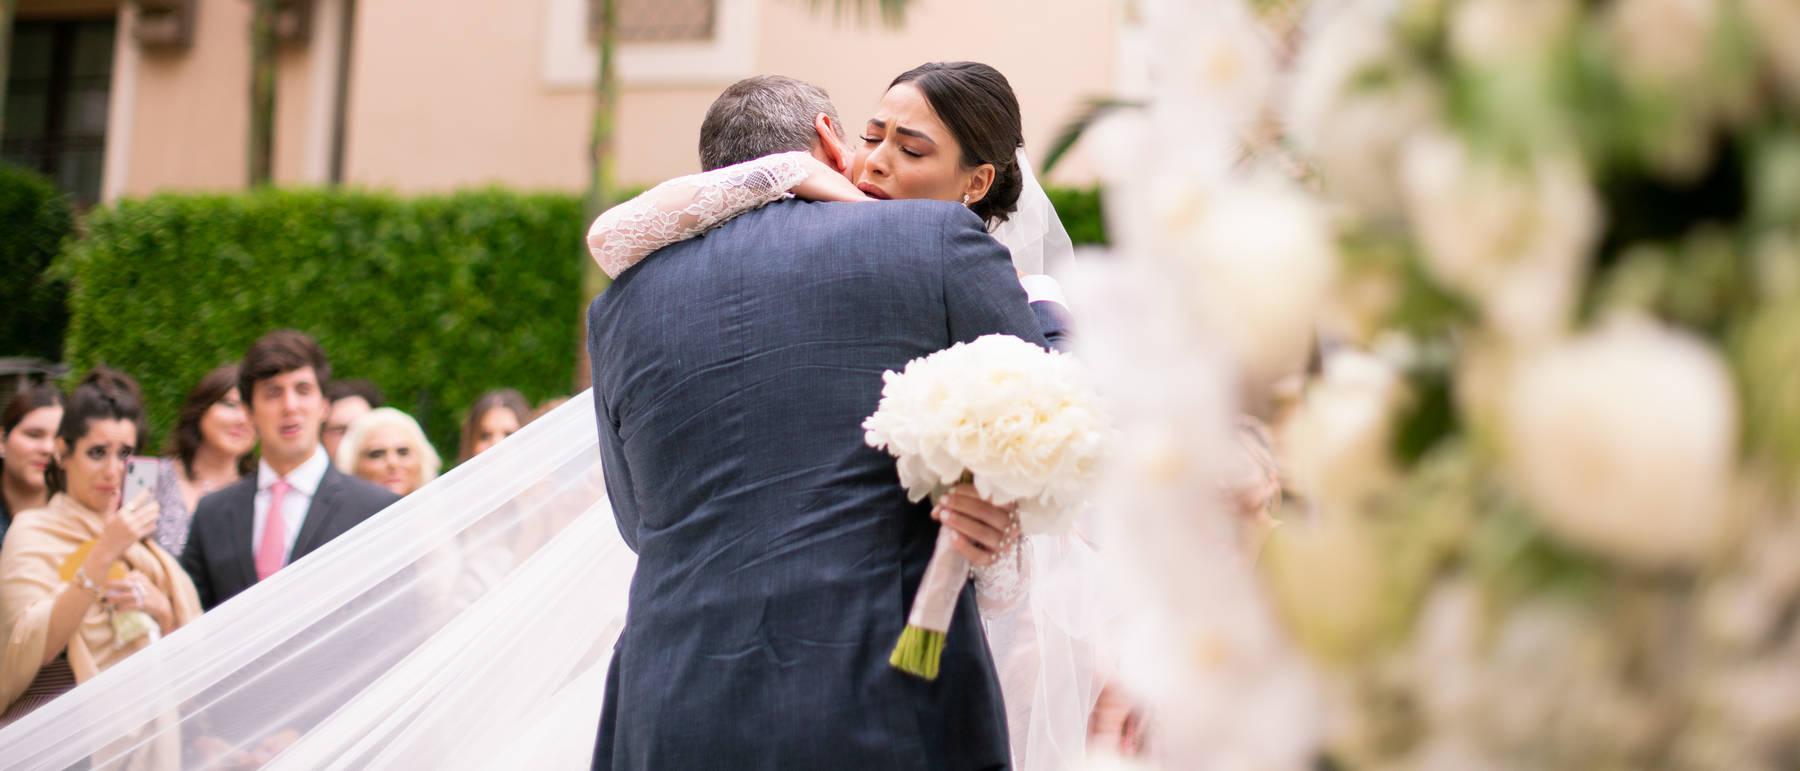 johnandjoseph-wedding-photographer-hz-slider-238